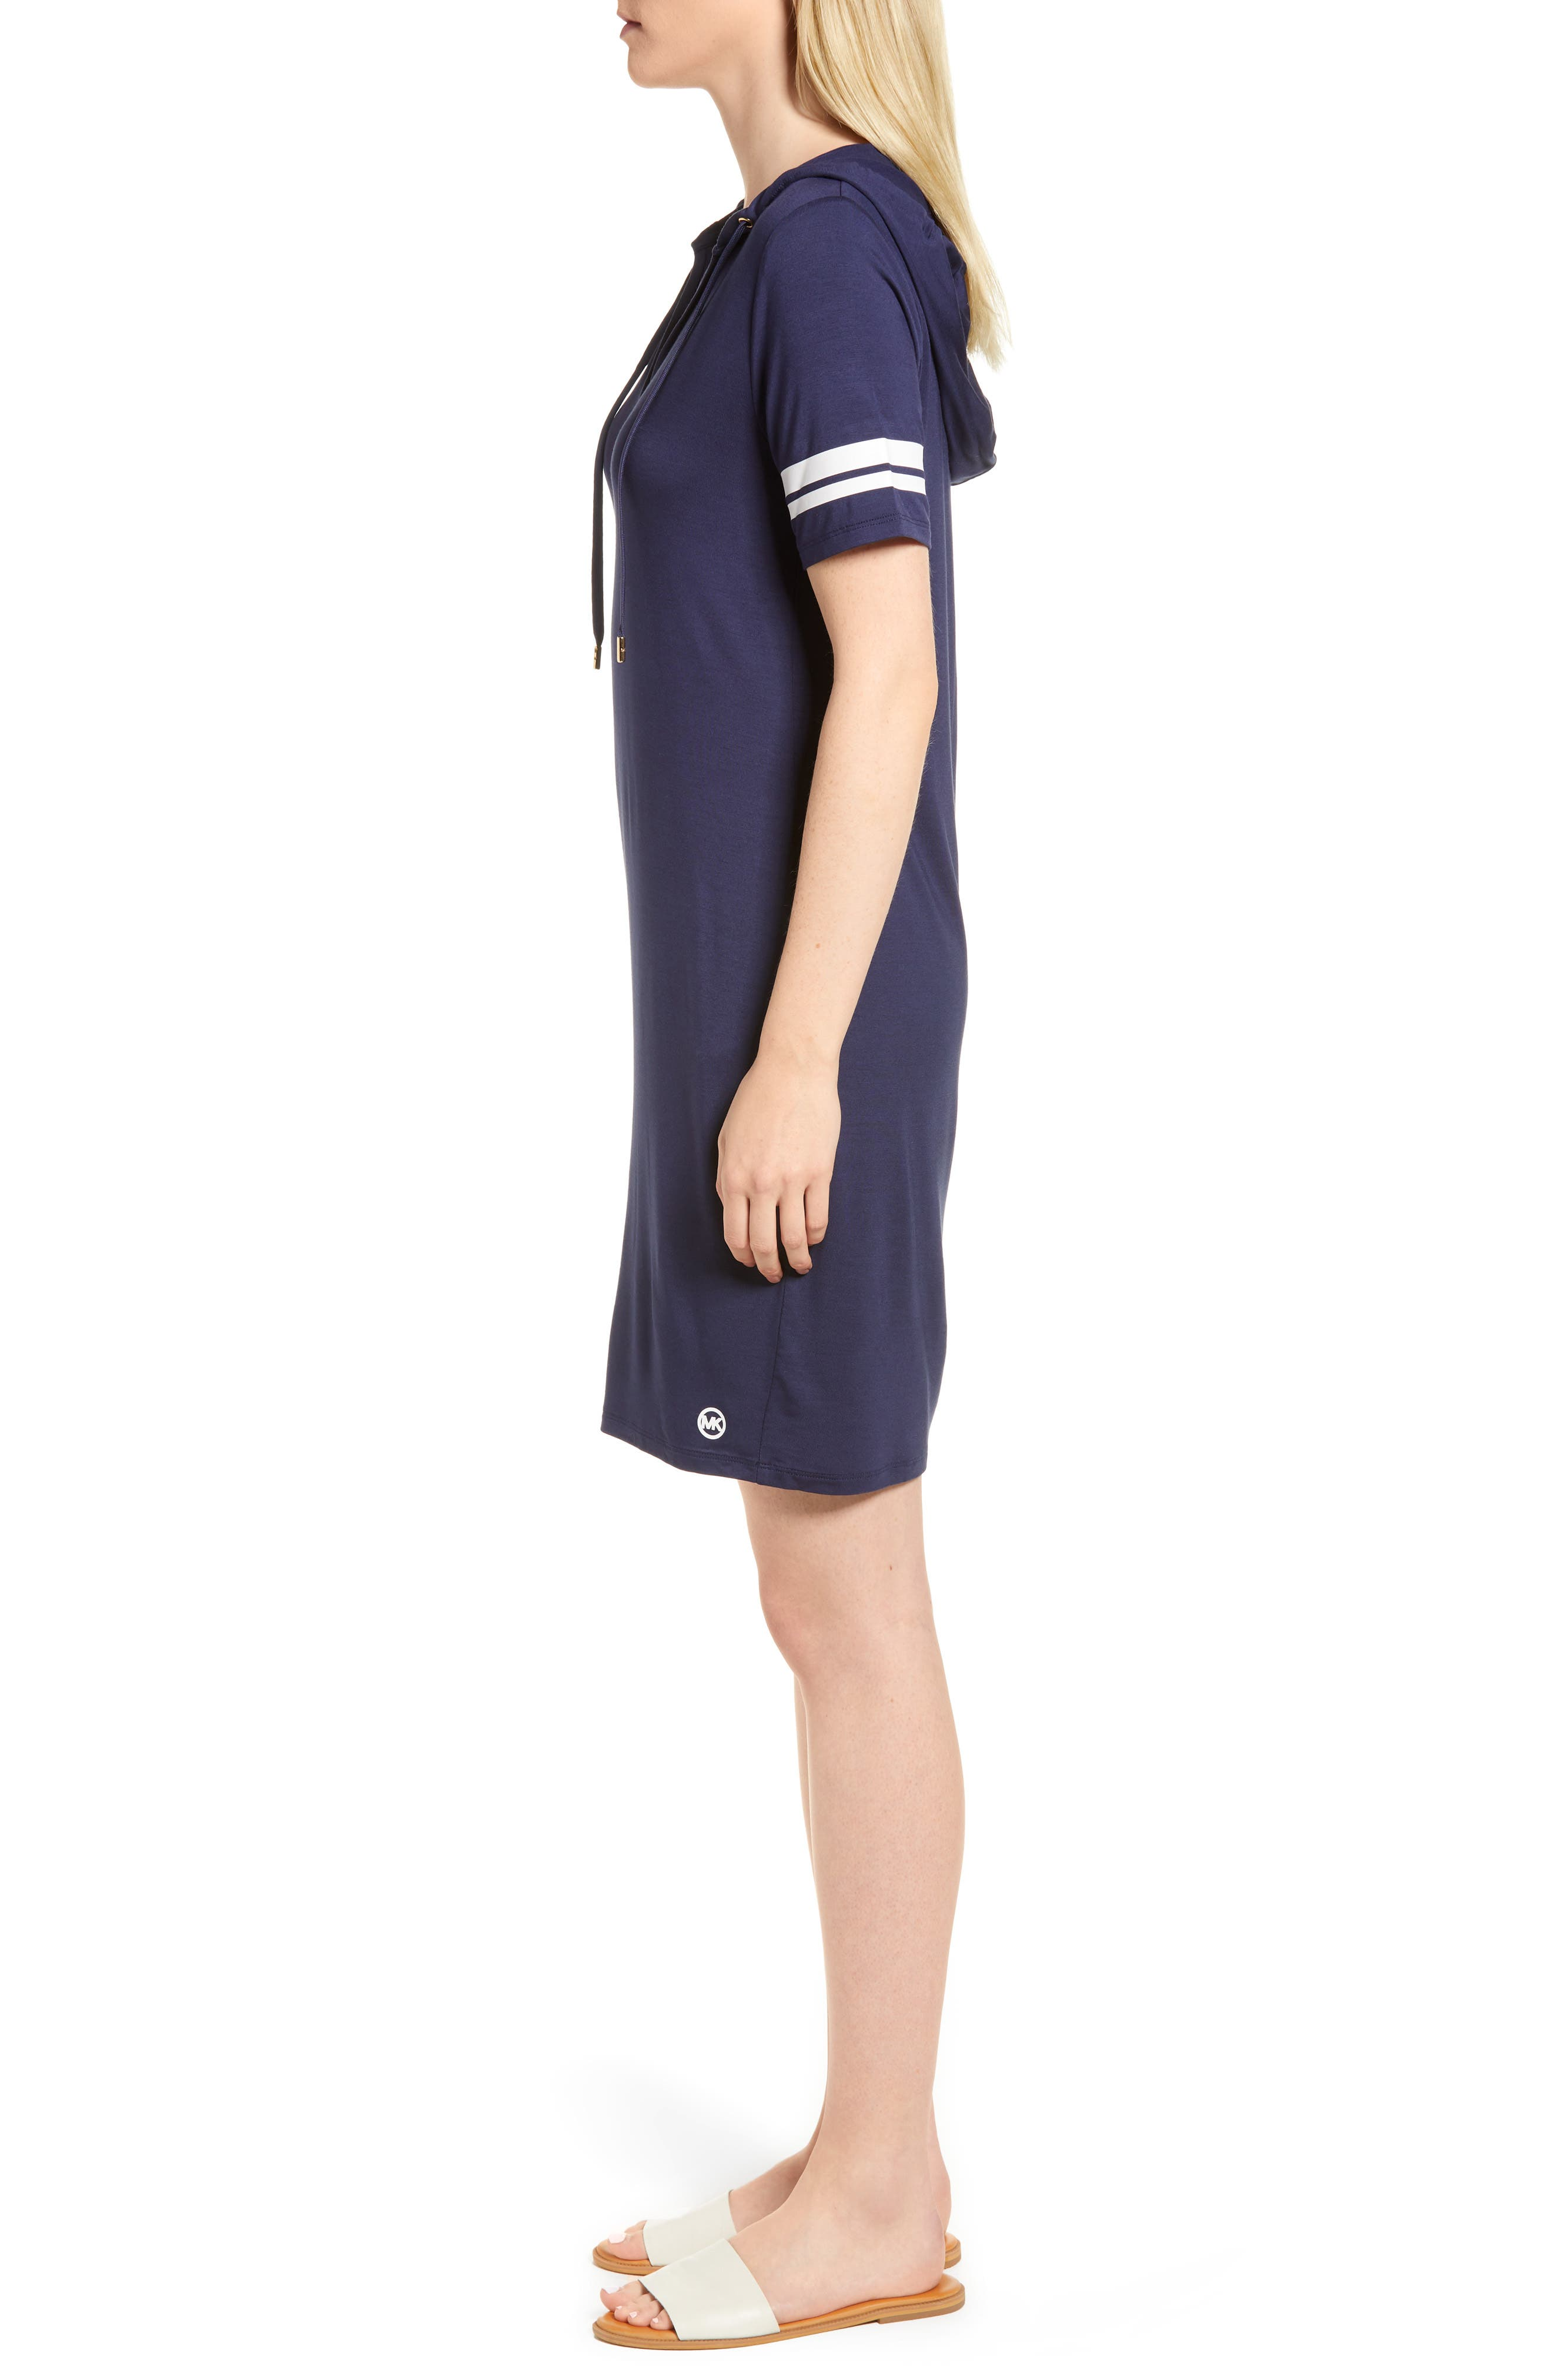 MICHAEL Michal Kors Stripe Sleeve Hoodie Dress,                             Alternate thumbnail 7, color,